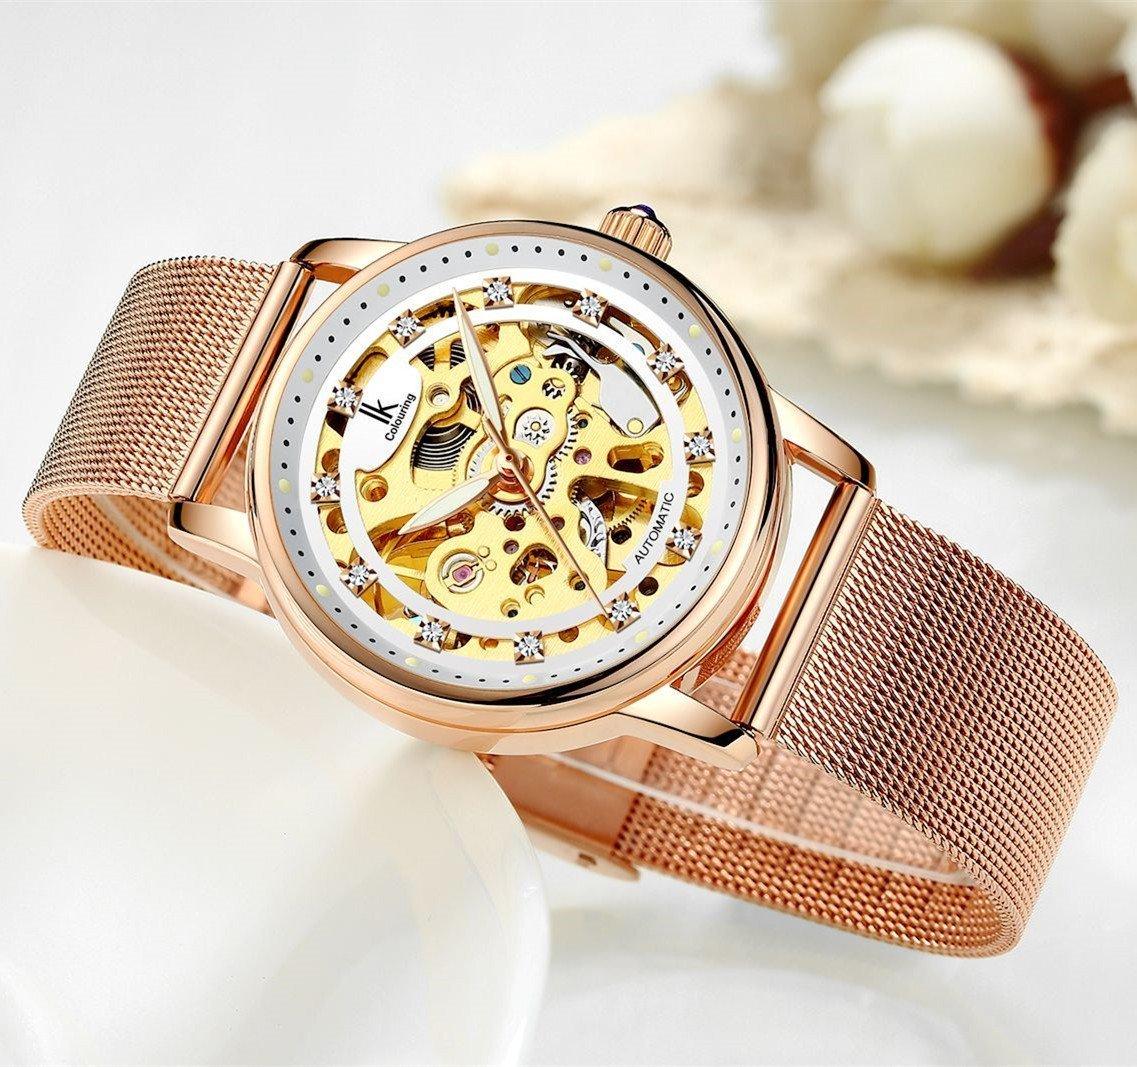 Womens Watch,Stone Automatic Dress Watch Luxury Skeleton Wrist Watch for Lady,Rose Gold Tone by Stone (Image #5)